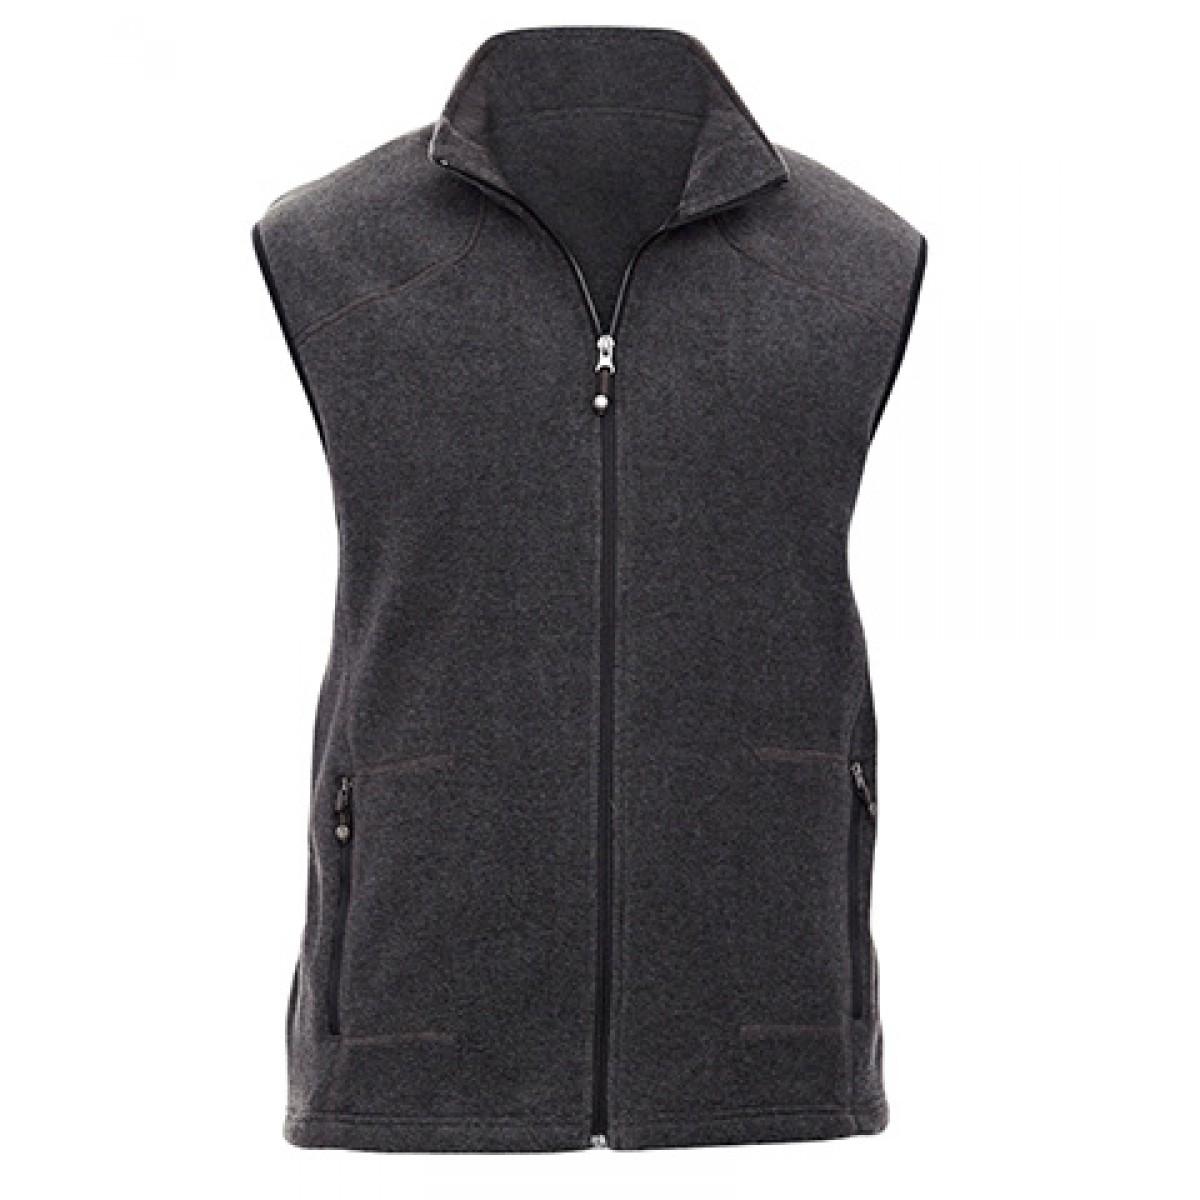 Men's Voyage Fleece Vest-Gray -5XL